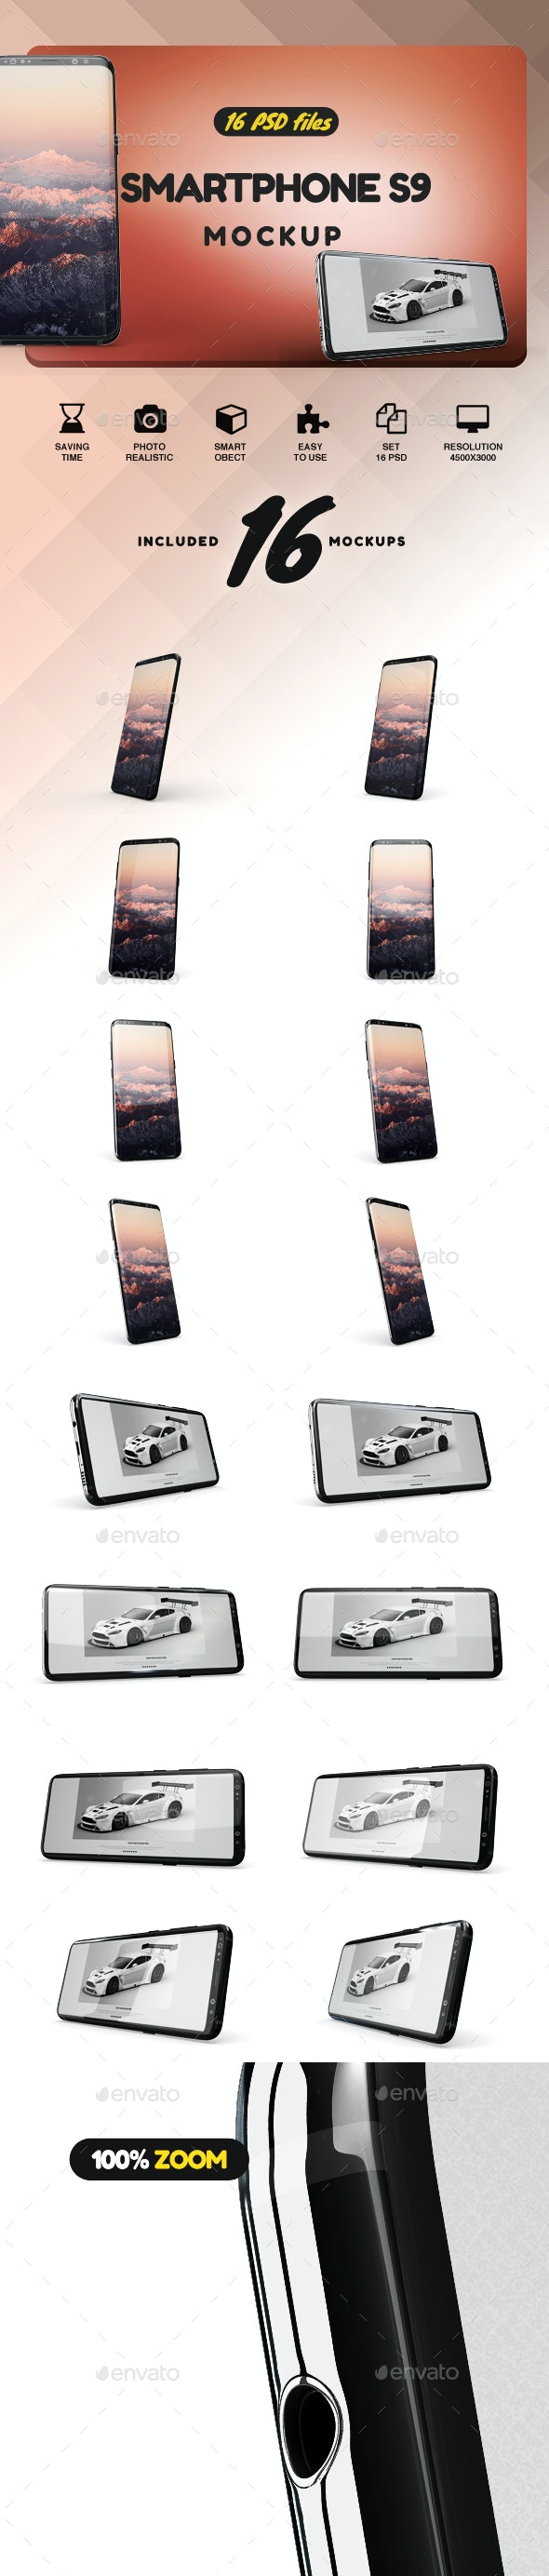 SmartPhone Galaxy S9 App Mockup - Product Mock-Ups Graphics